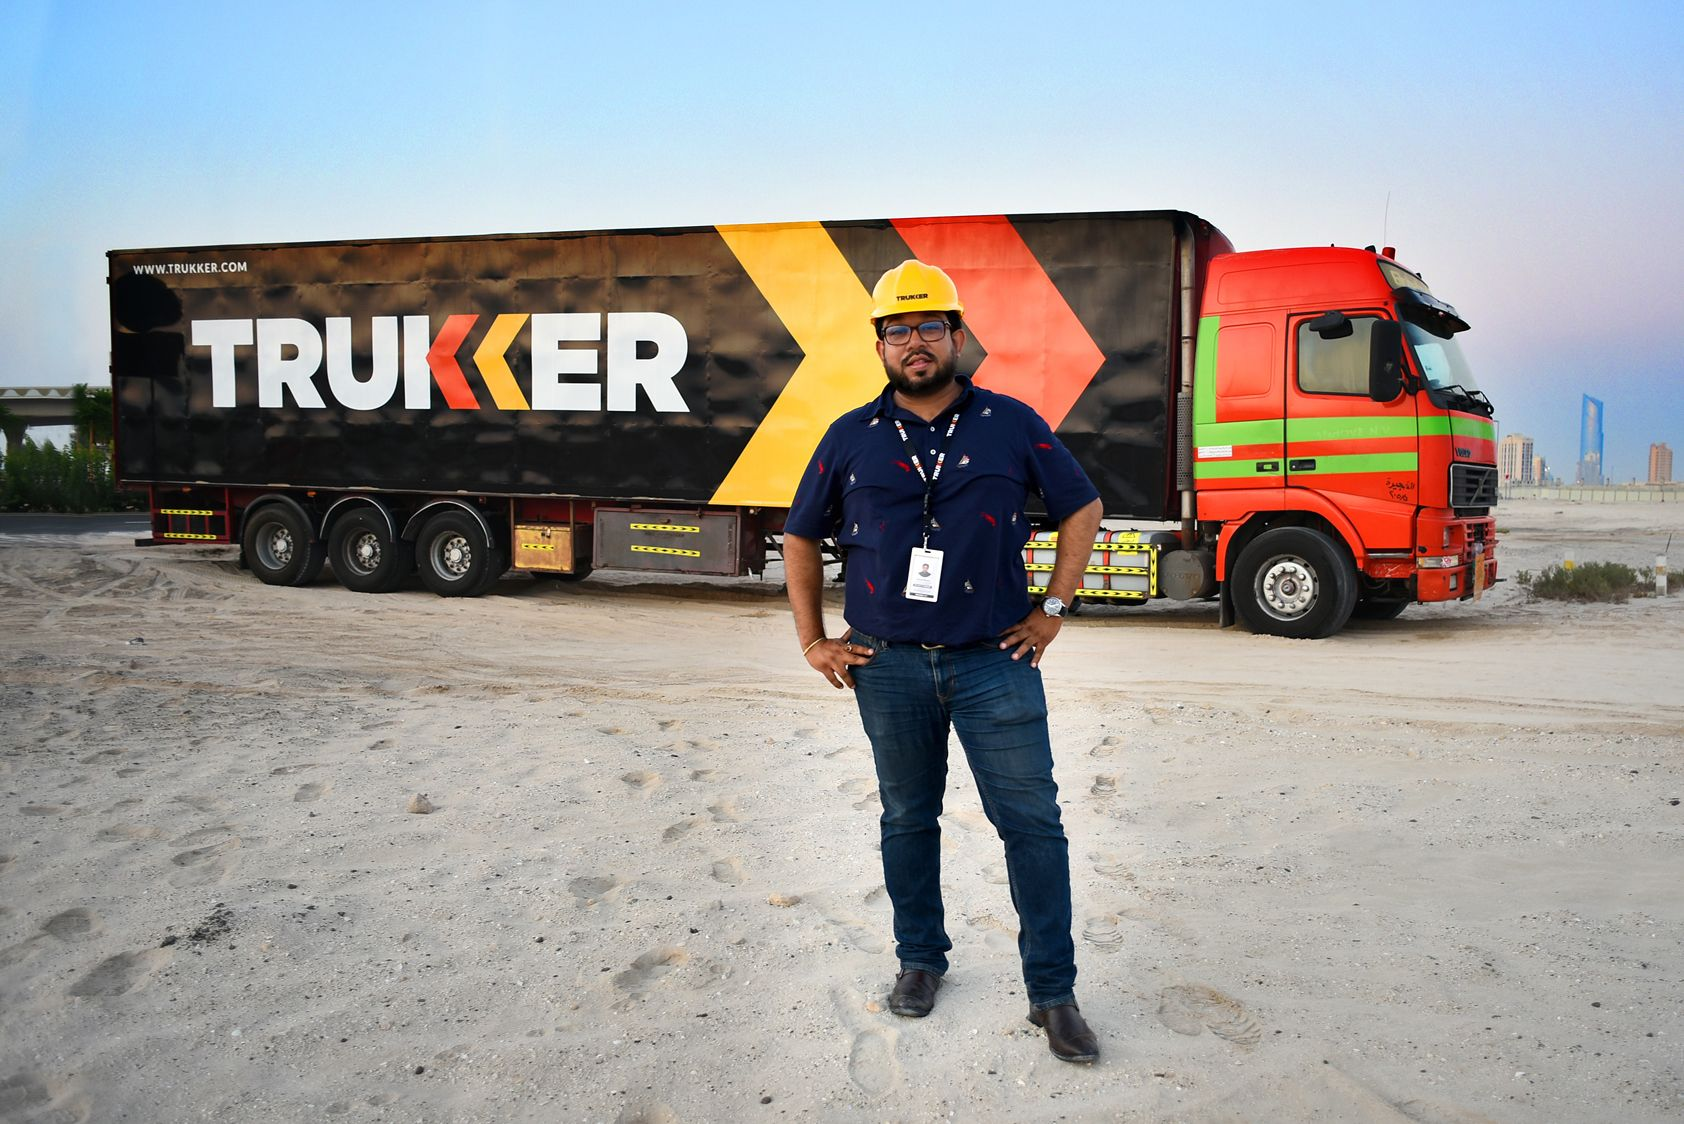 TruKKer raises $23 million in Series A